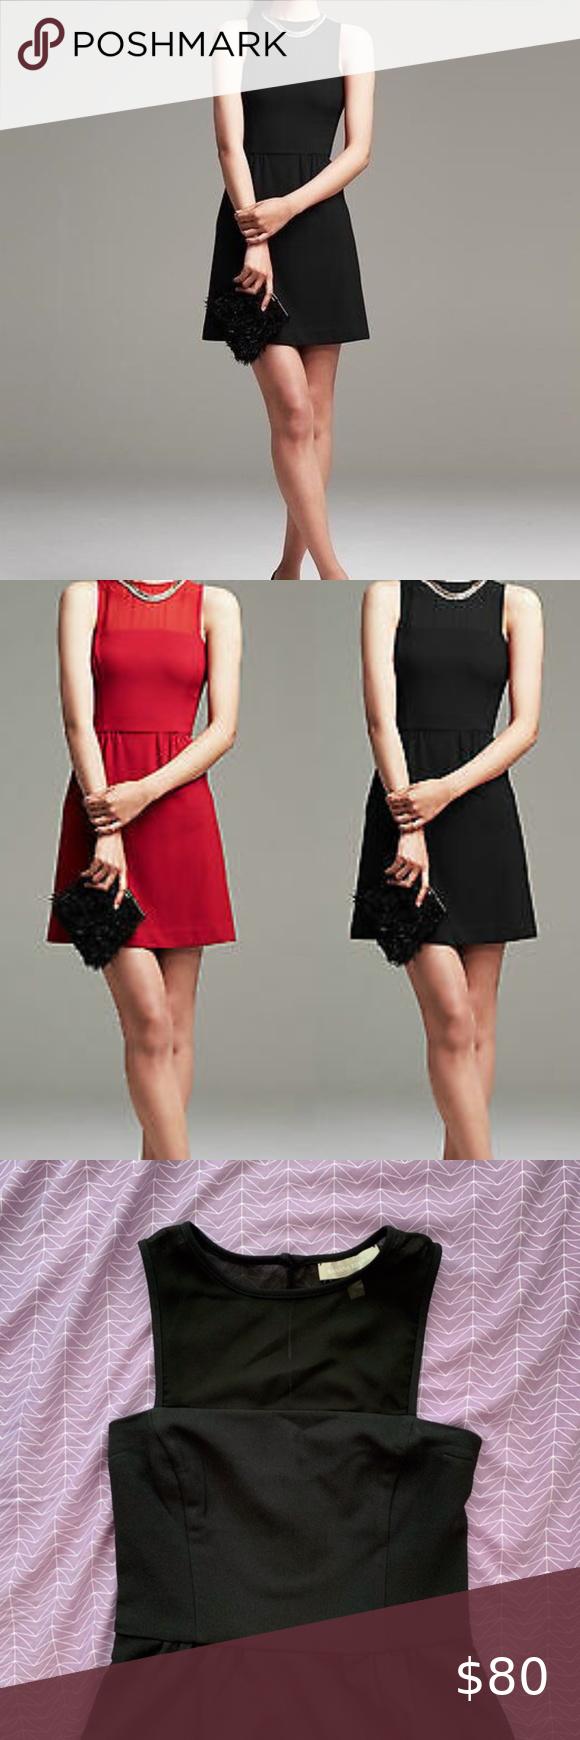 Nwot Banana Republic Sheer Inset Black Dress Black Dress Fit And Flare Dresses [ 1740 x 580 Pixel ]